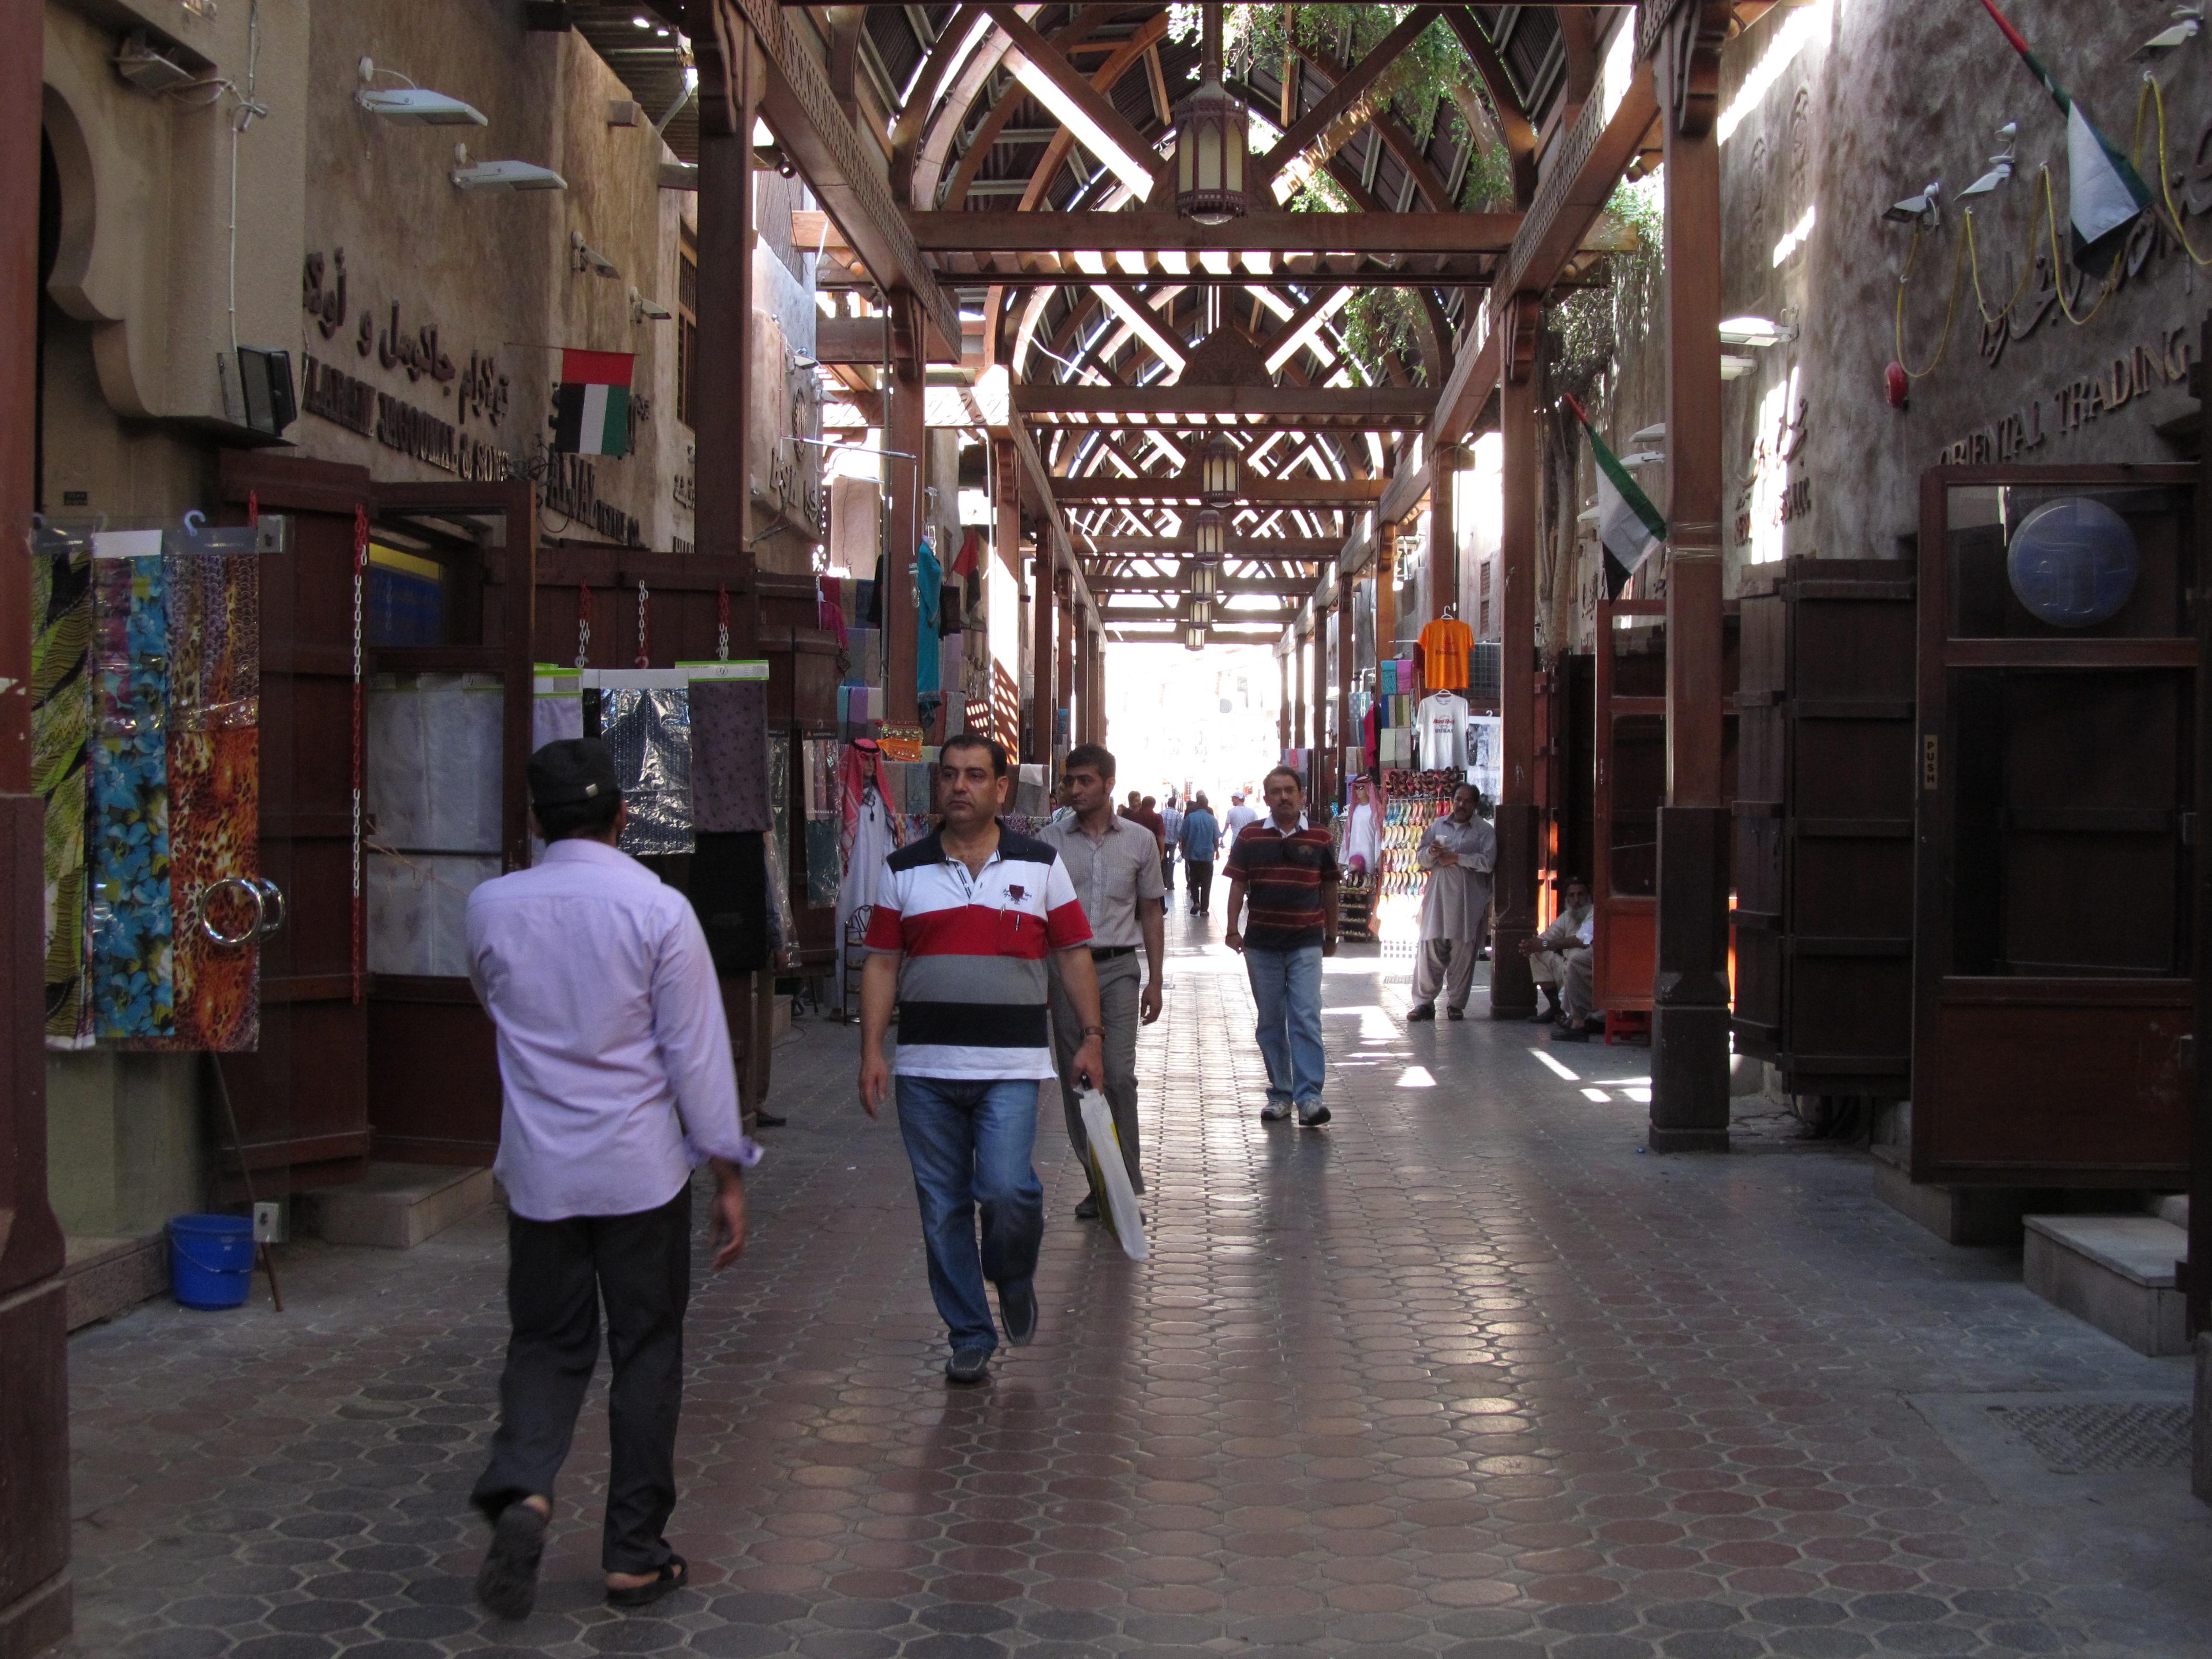 bur dubai hindu personals Dubai shopping: 5 don't-miss spots parallel to the creek in bur dubai here you'll find the shri nathje jayate temple and a hindu lane.